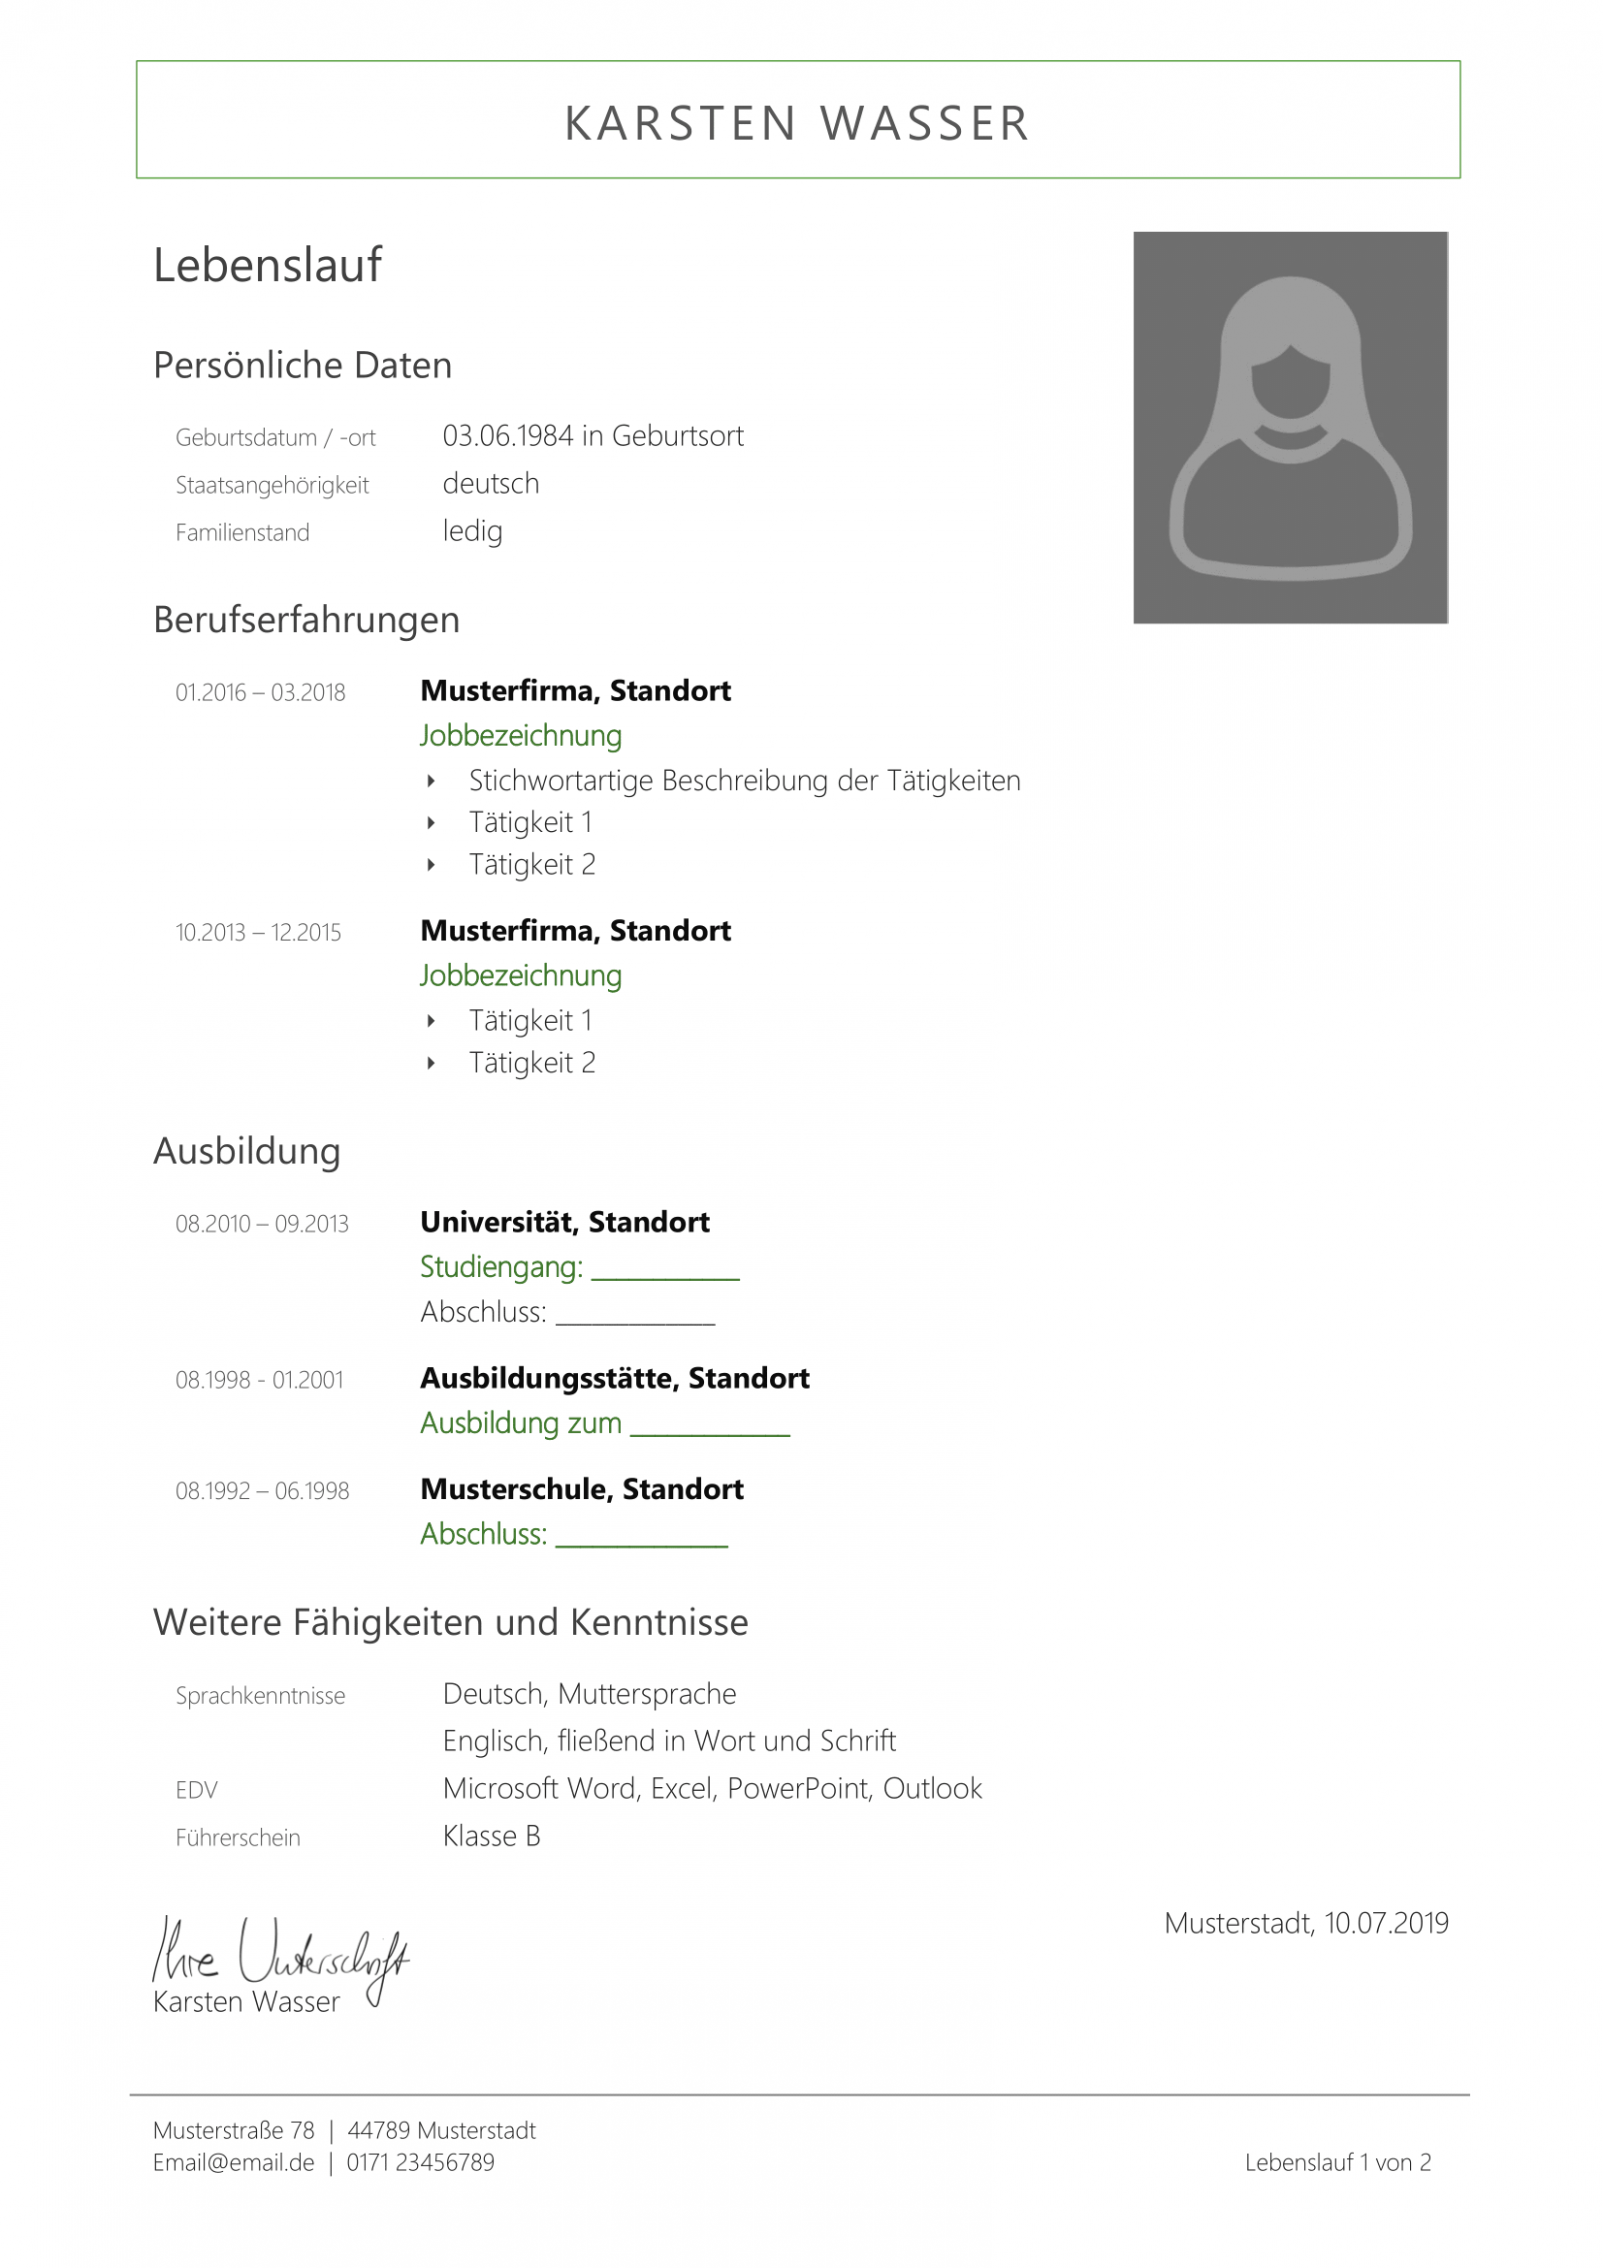 Xing Lebenslauf Vorlage Download In 2020 Resume Template Free Curriculum Vitae Resume Invitation Template